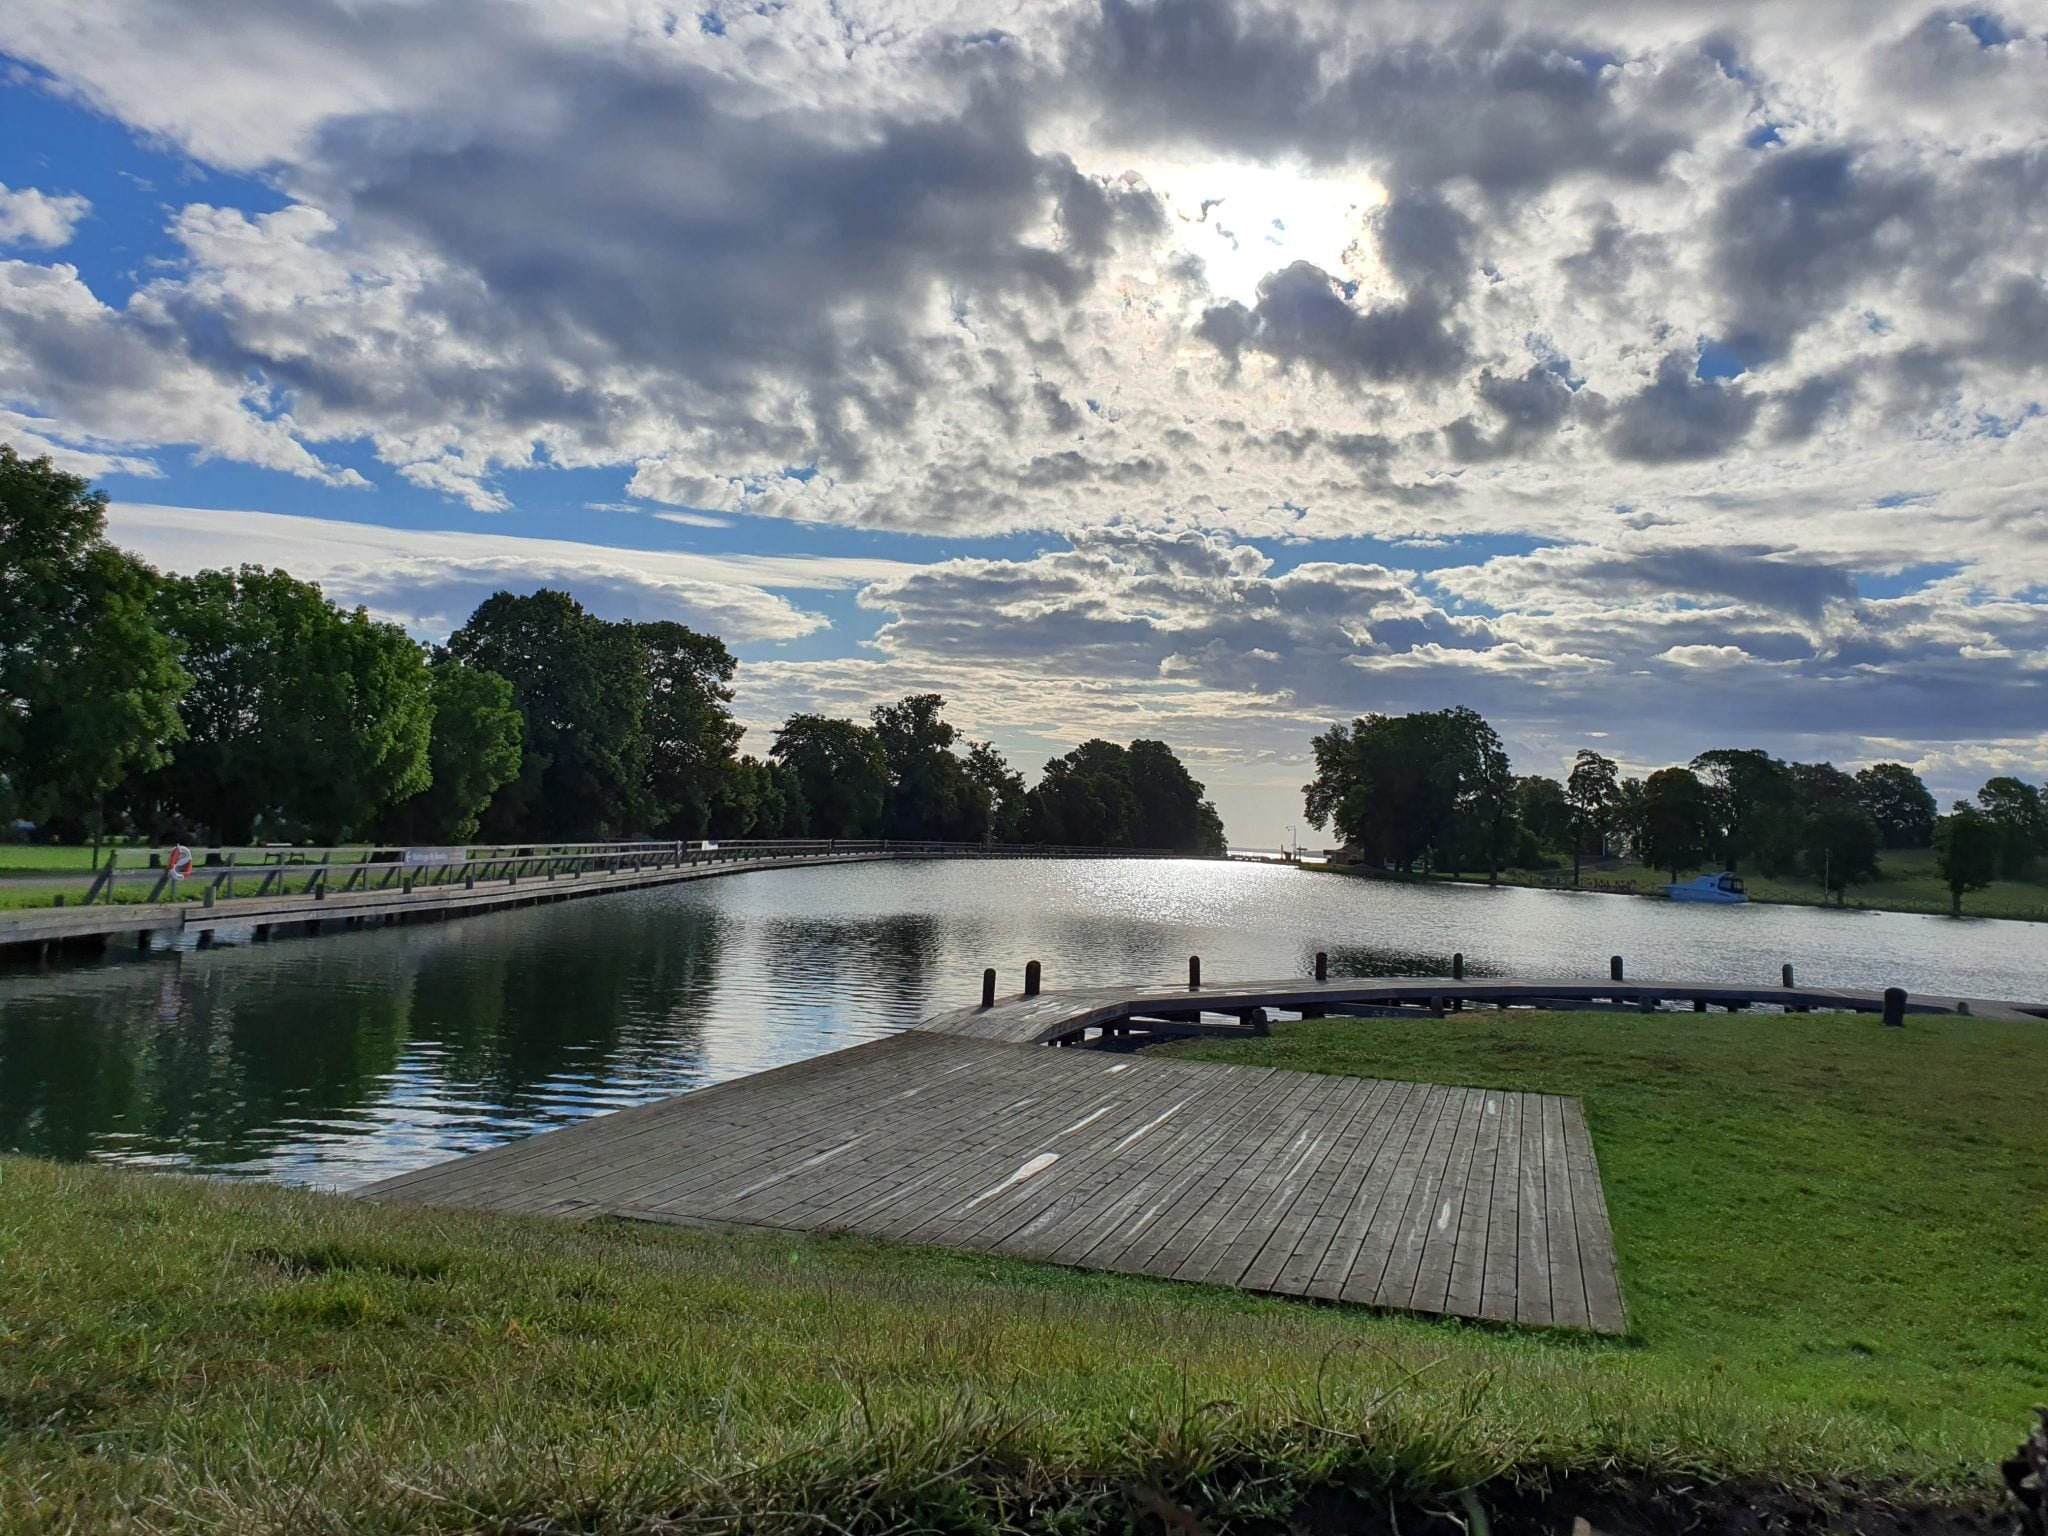 Bergs Slussar, Linköping